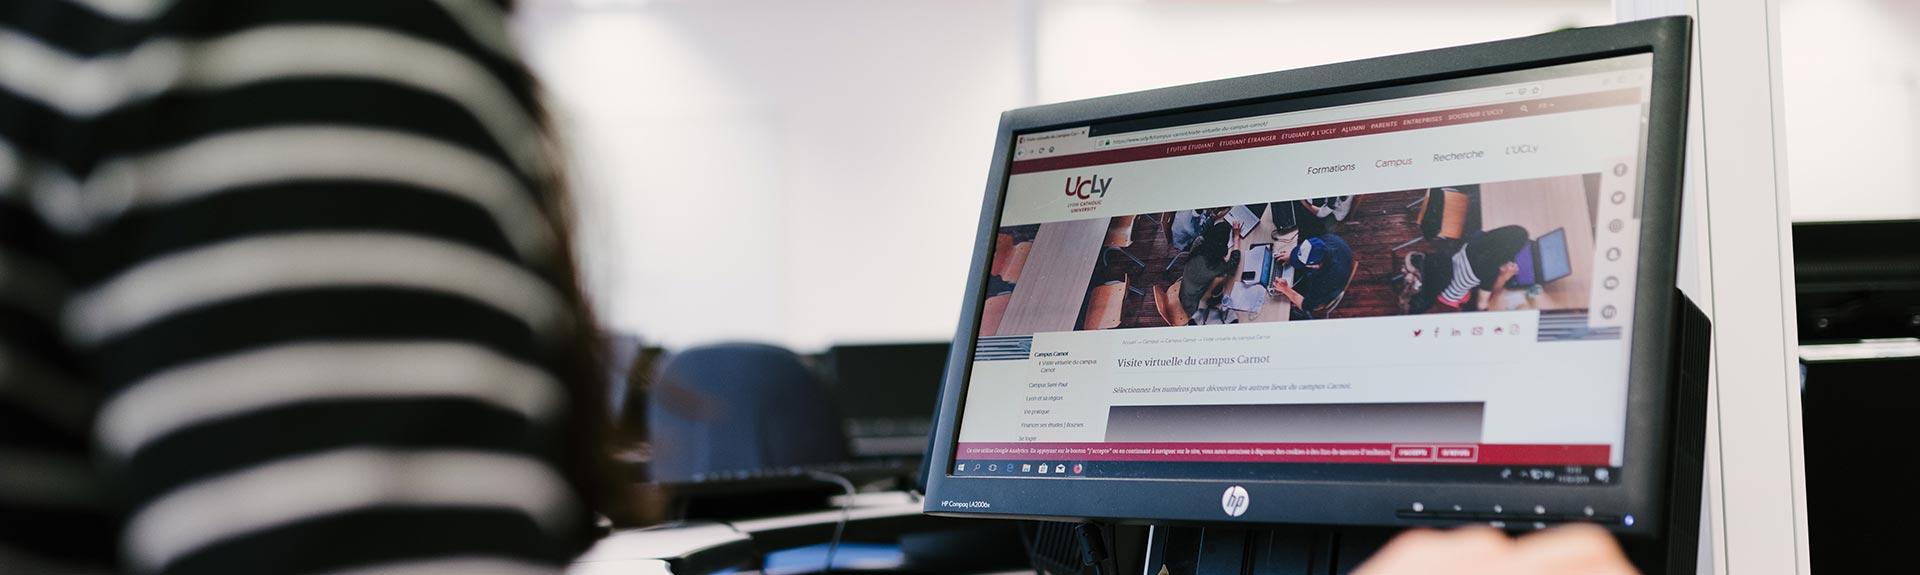 Contacter ILCF